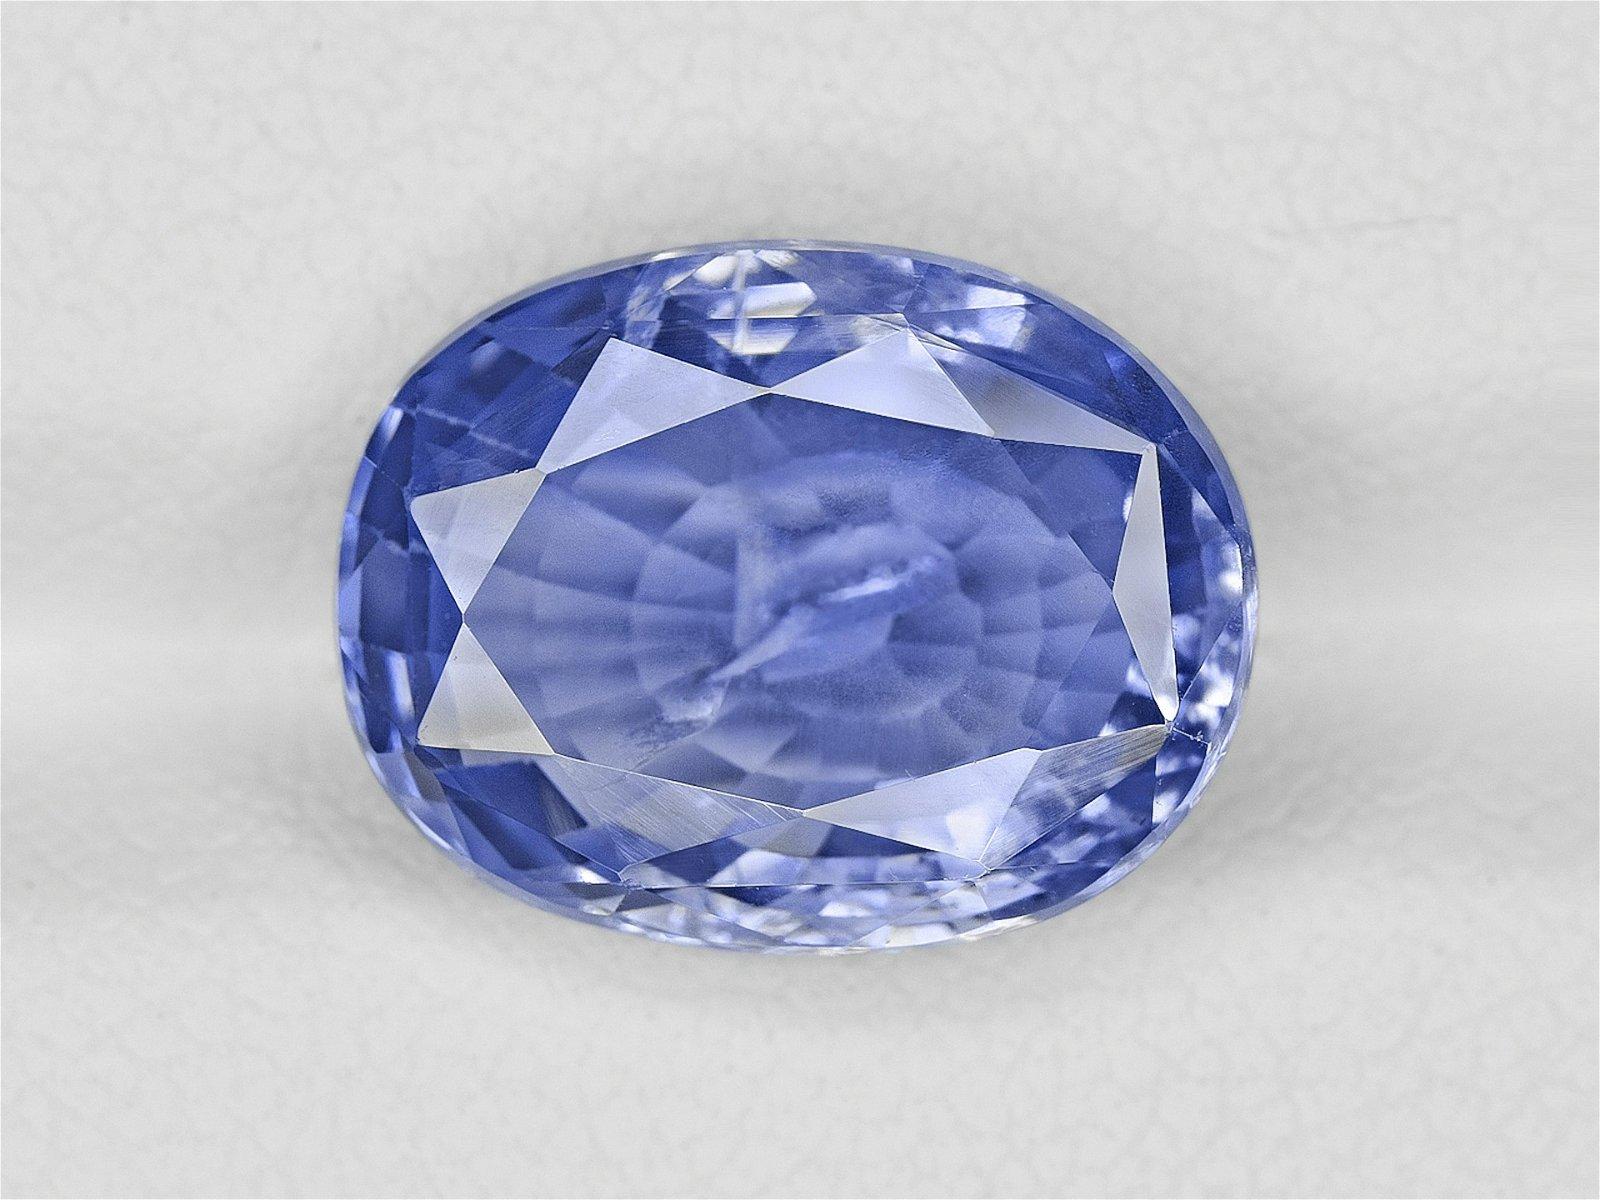 Blue Sapphire, 8.70ct, Mined in Sri Lanka, Certified by